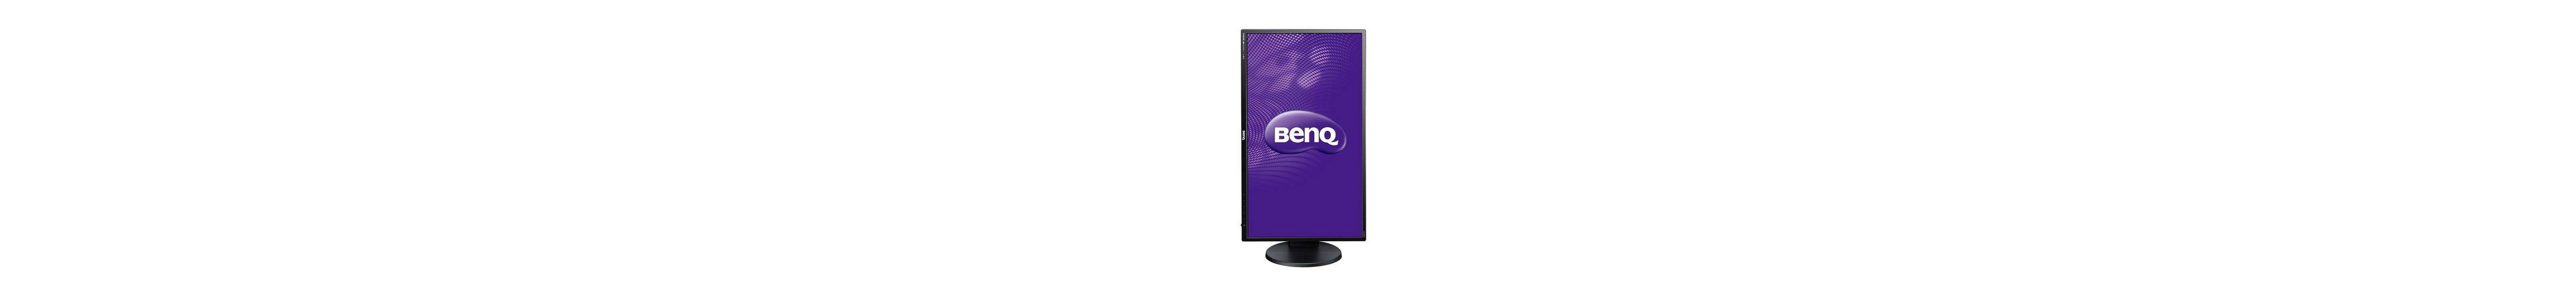 BENQ VA LED Display »BL2700HT 68,58cm Wide TFT VA LED (9H.LCSLB.QBE)«